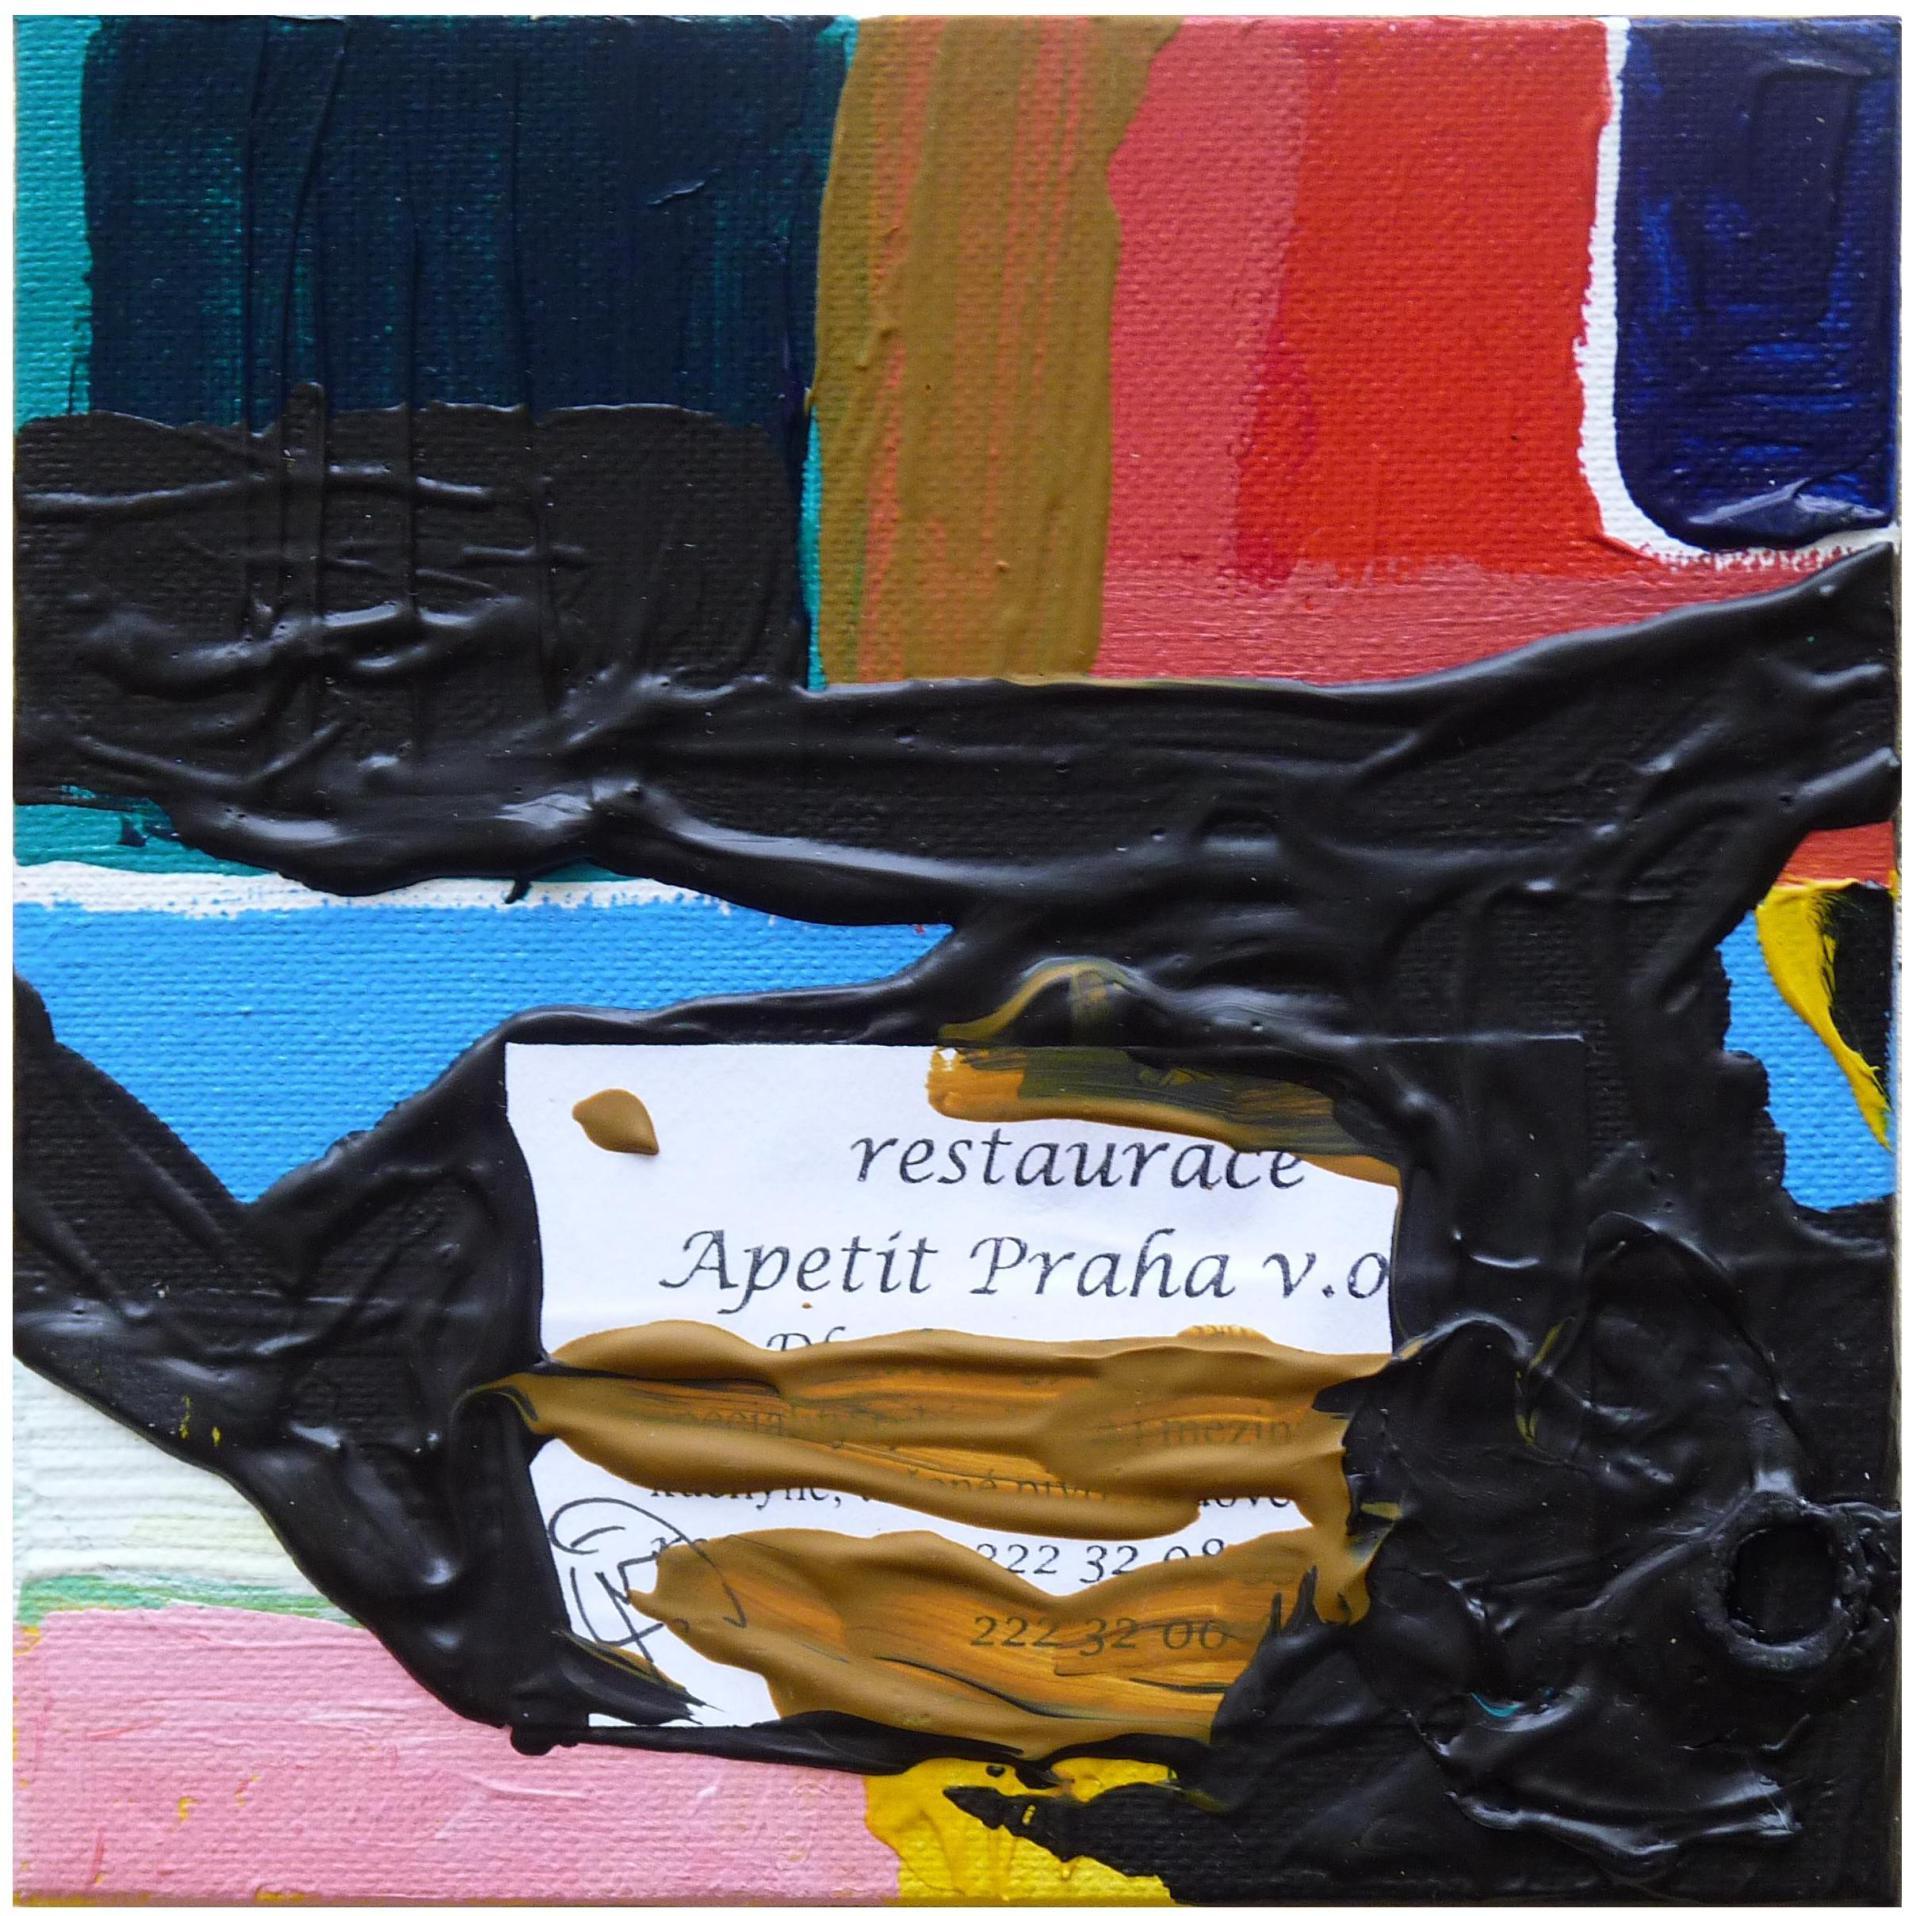 APETITE PRAHA Mixed Media on Canvas 2010 15x15cm LABELS 2